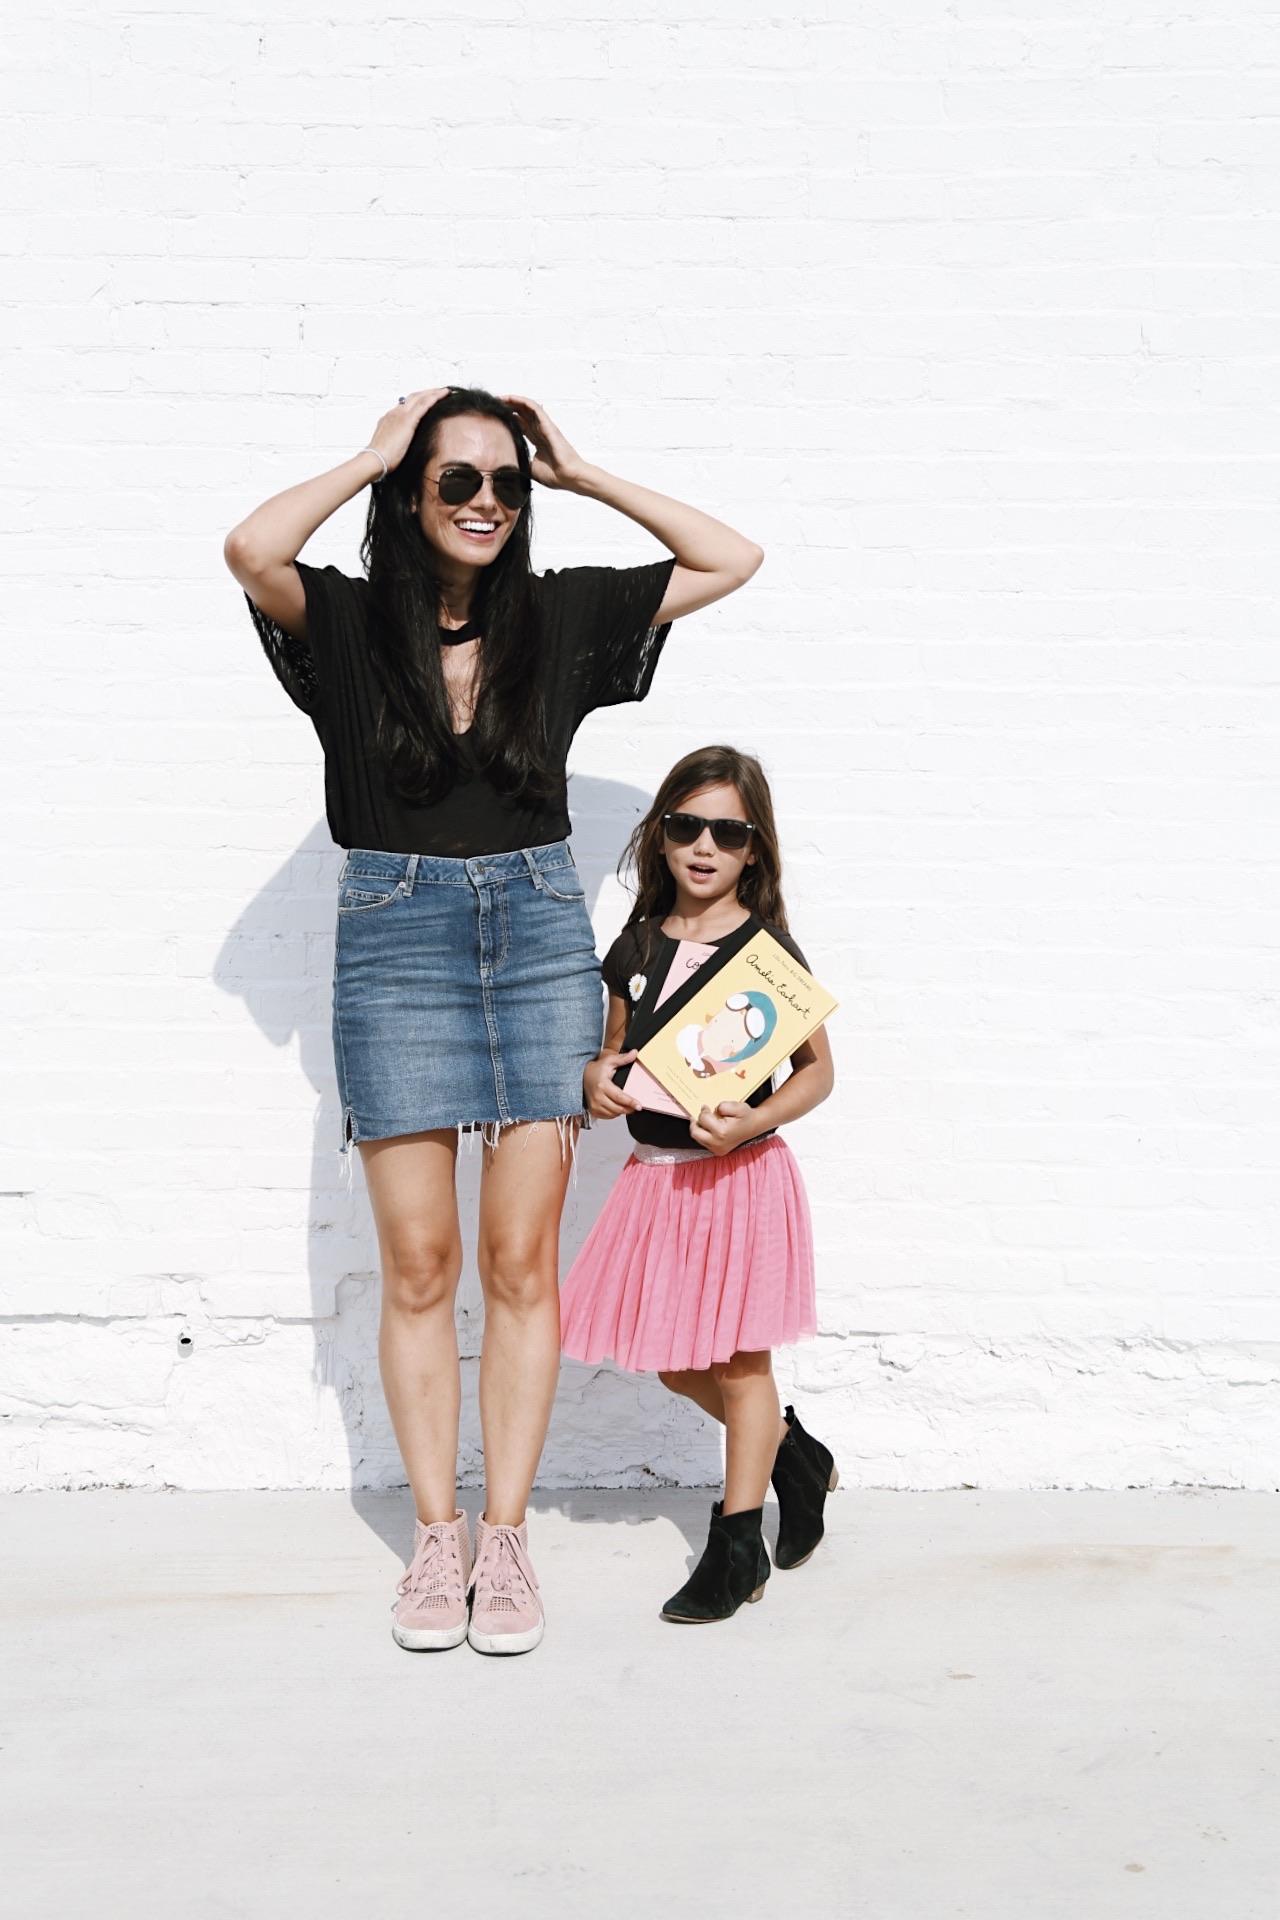 |  aviators  |  black cutout tee  |  denim skirt  |  high tops  |  youth sunnies similar |  books  |  booties  |  skirt  |  tee (similar  |   | image by Sydney Clawson |